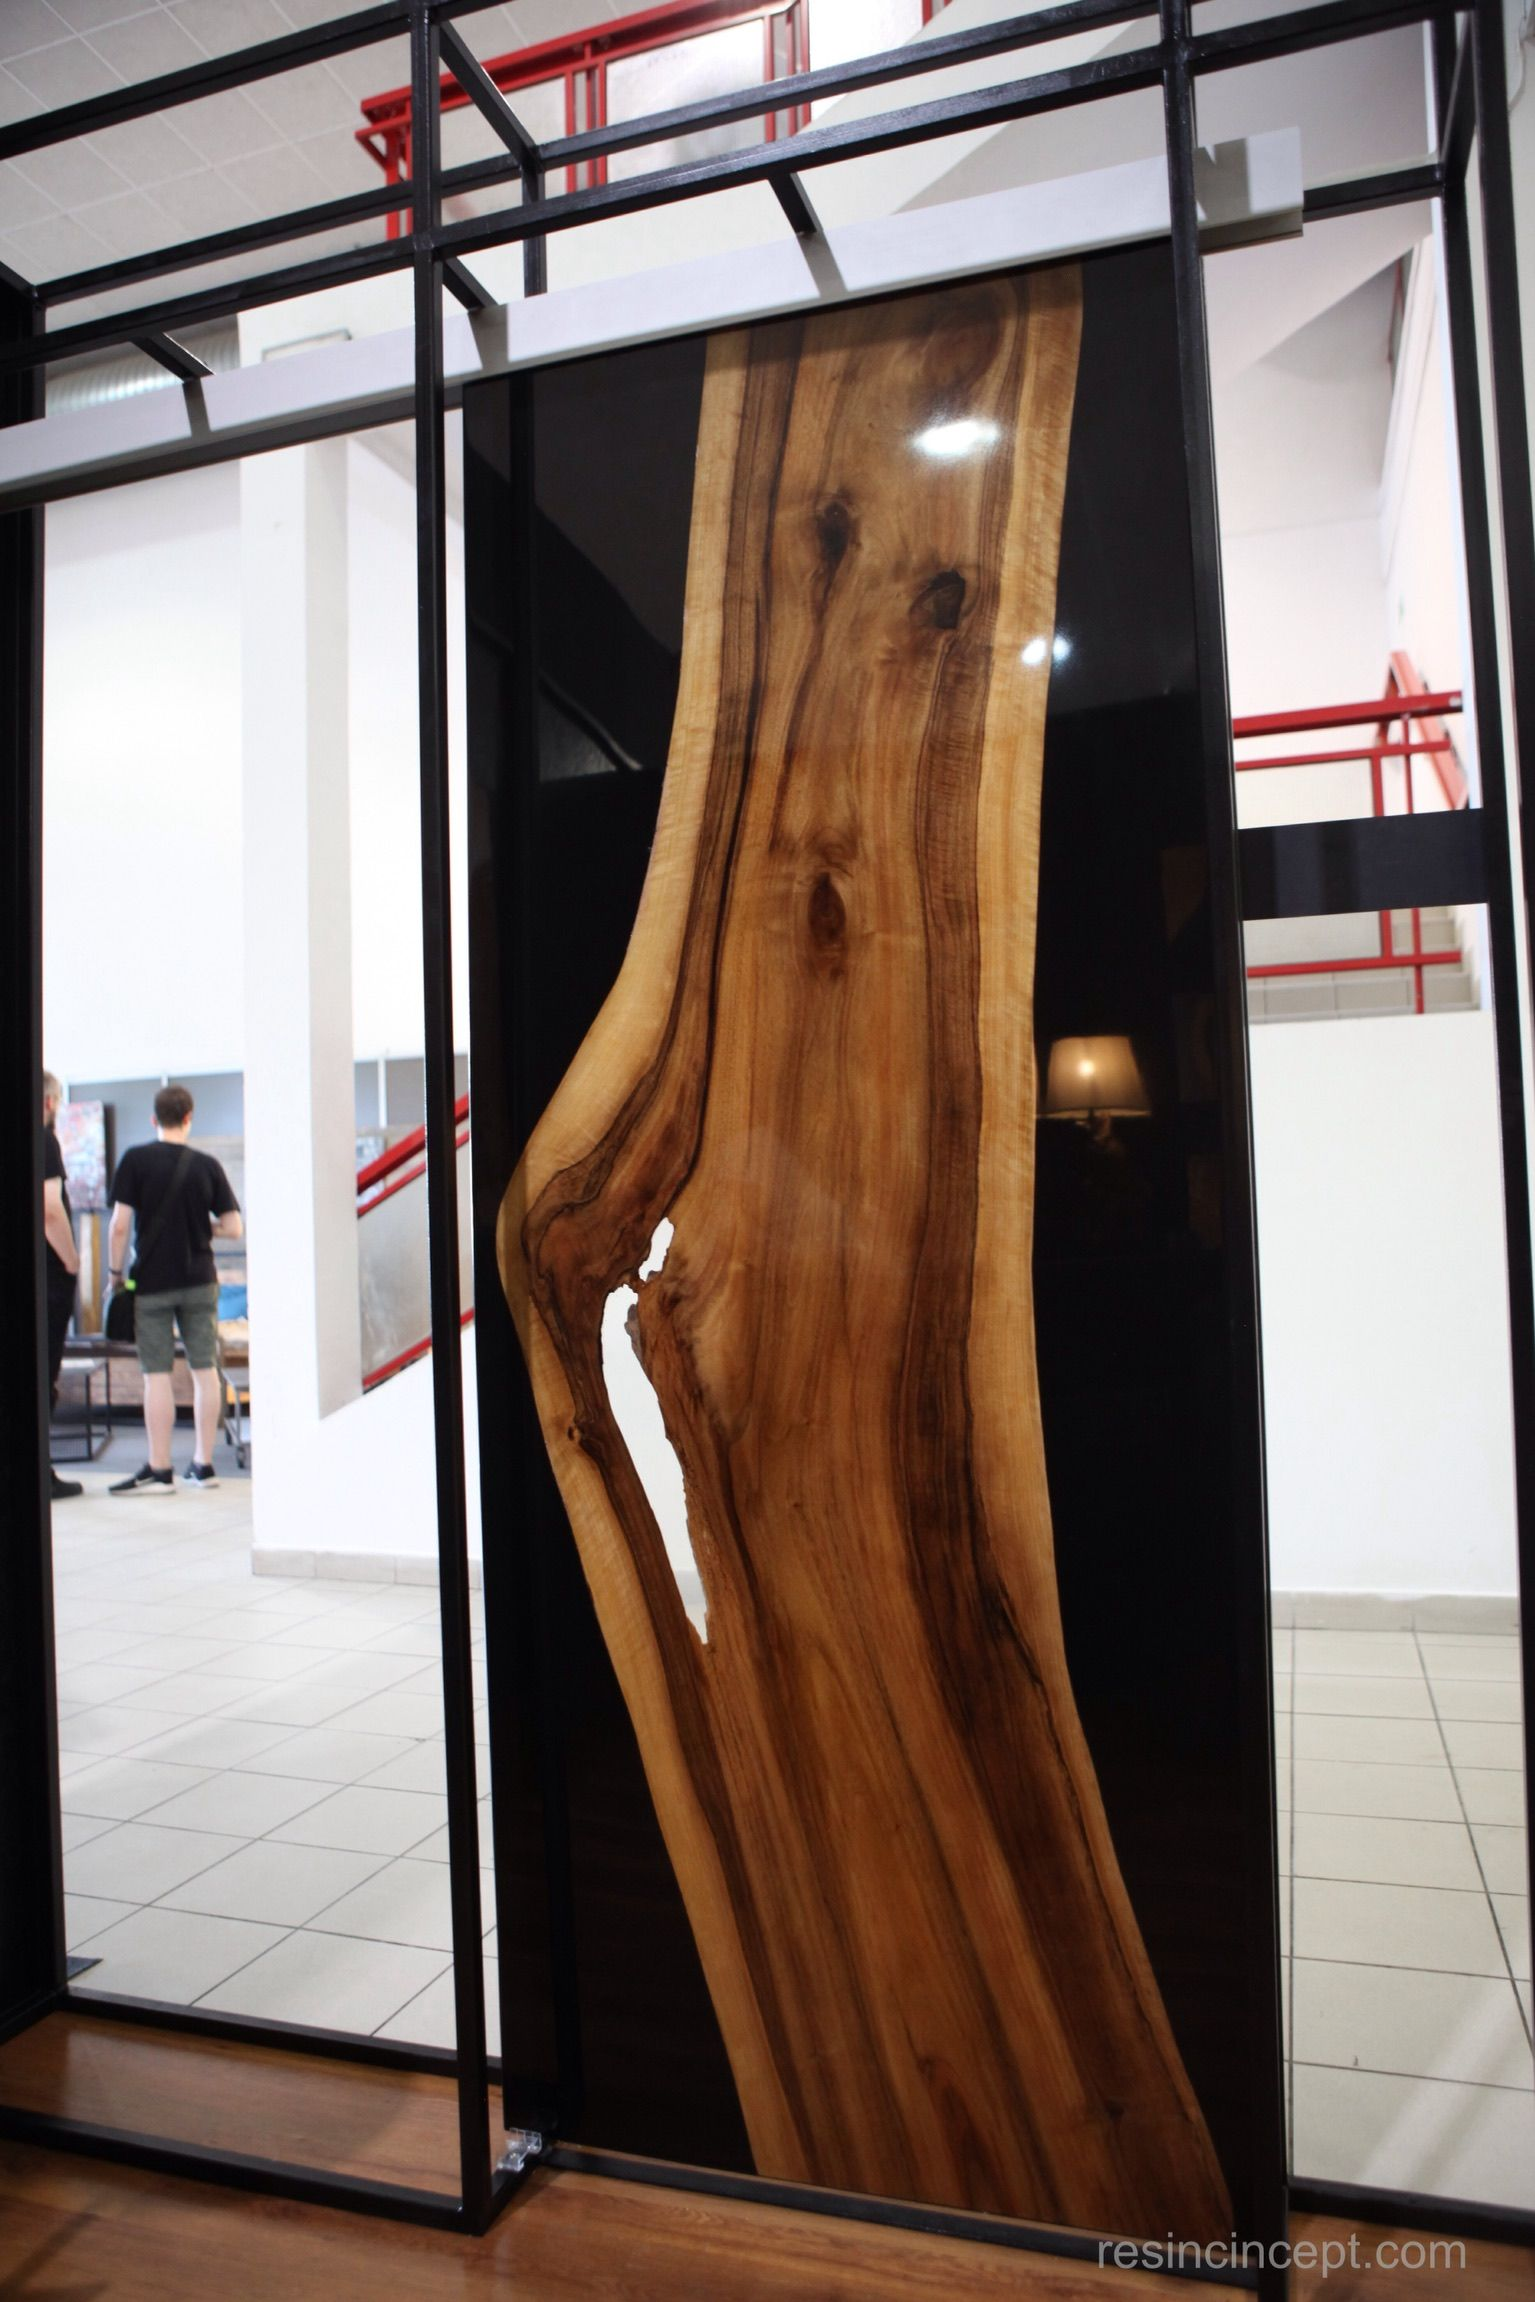 Epoxy Resin Walnut Sliding Doors Resin Concept Wood Epoxy